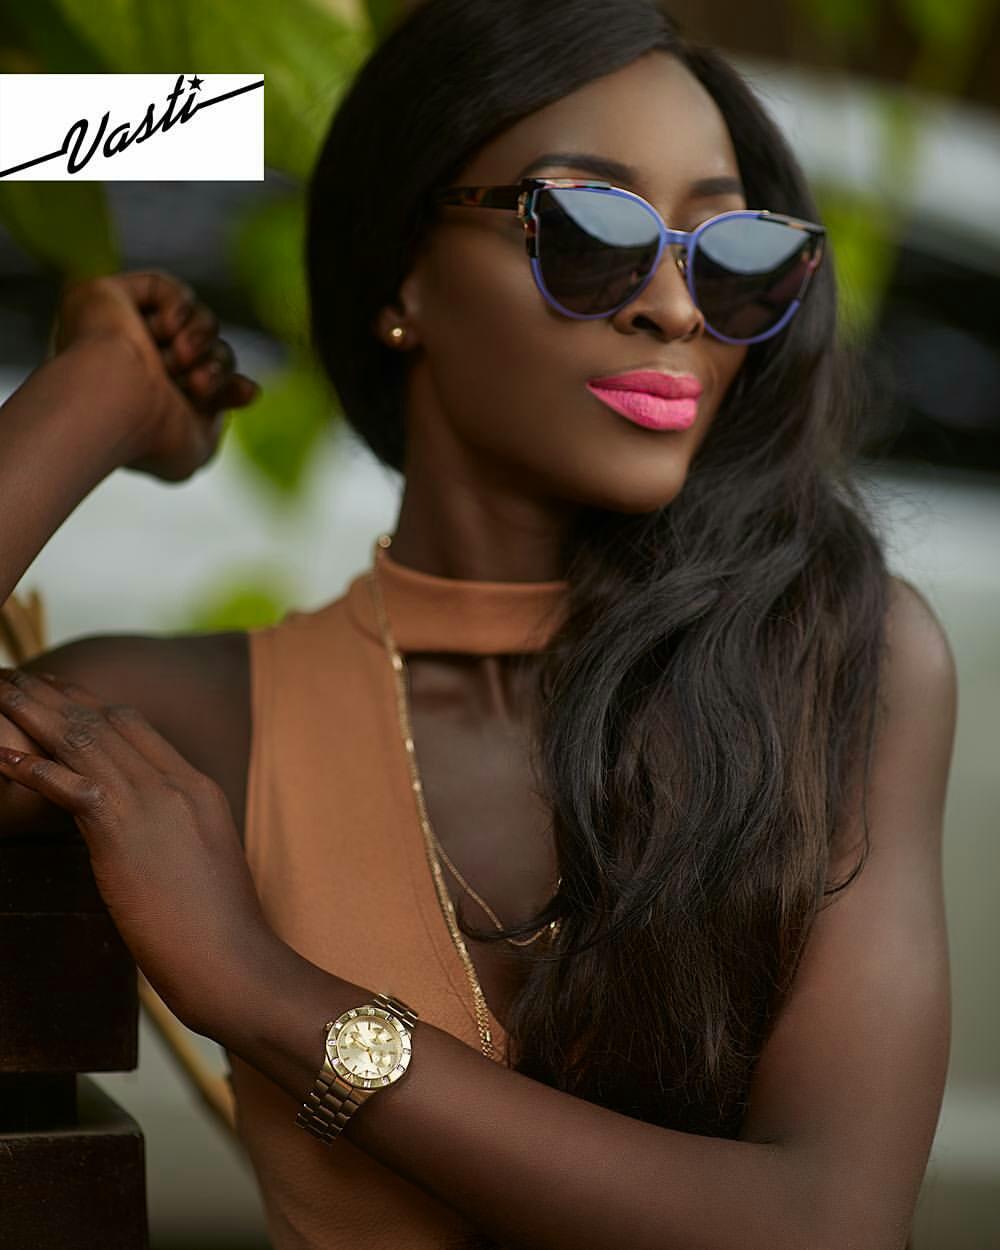 68e9e035a7 Ghana s Vastie s Eye Wear Presents Their Amazing Stunners For 2017 ...